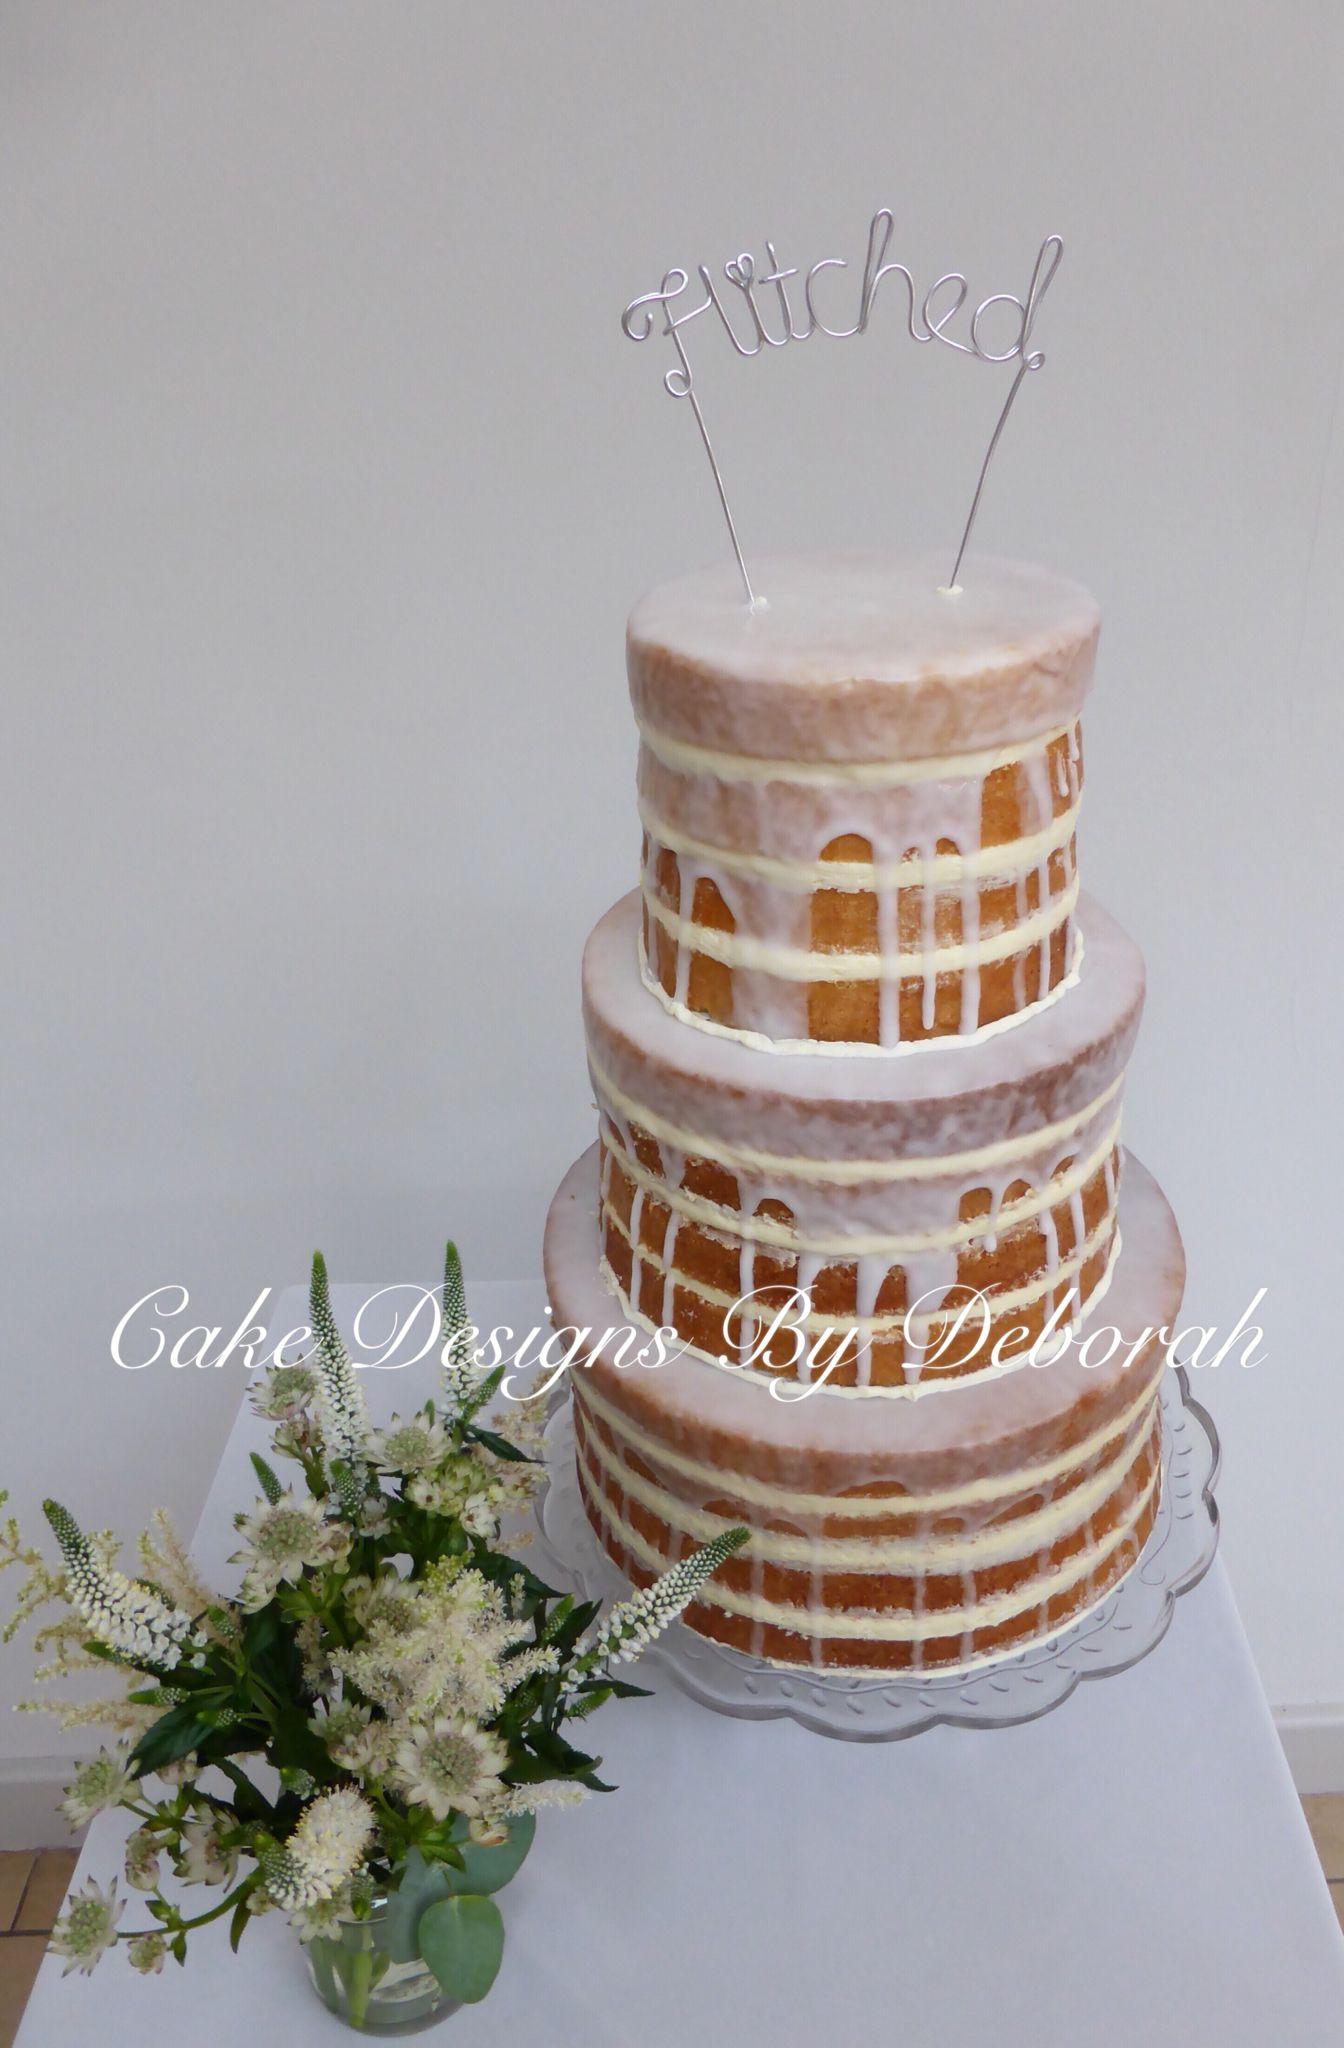 Cake Designs By Deborah : Boho Wedding Naked Lemon Drizzle Wedding Cake Cake Designs ...